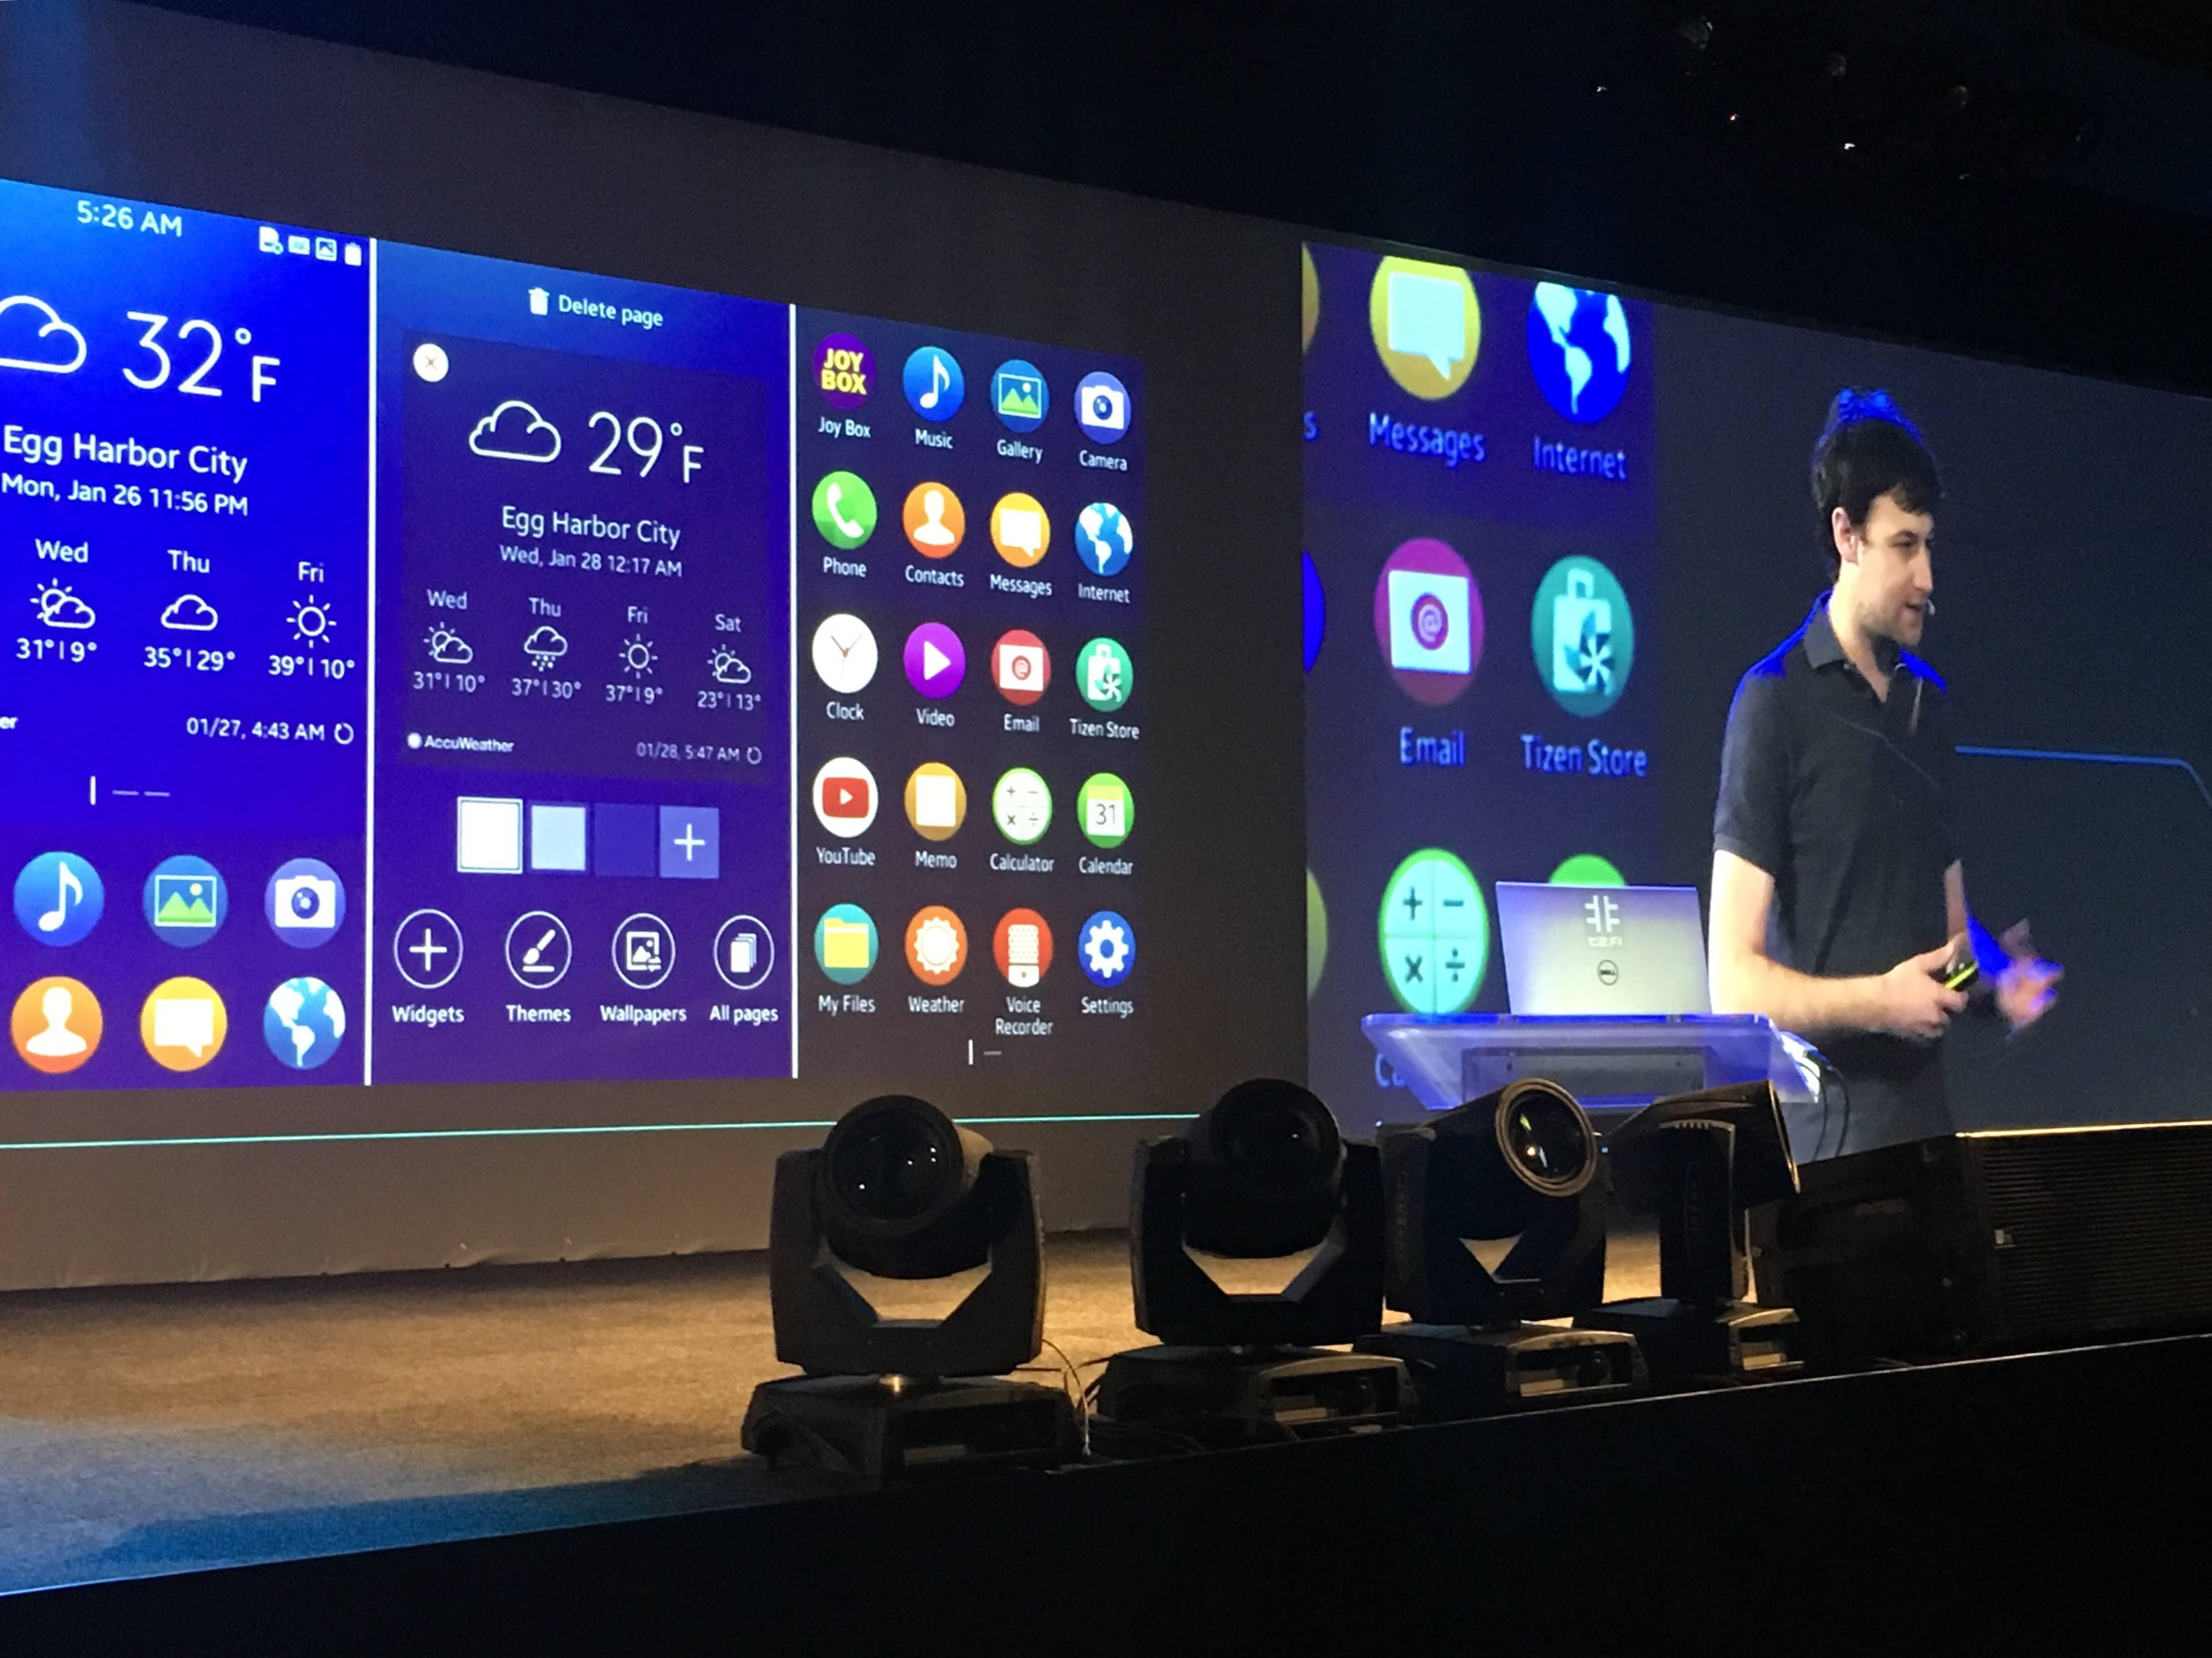 Samsung Tizen Security 'Feels like 2005'